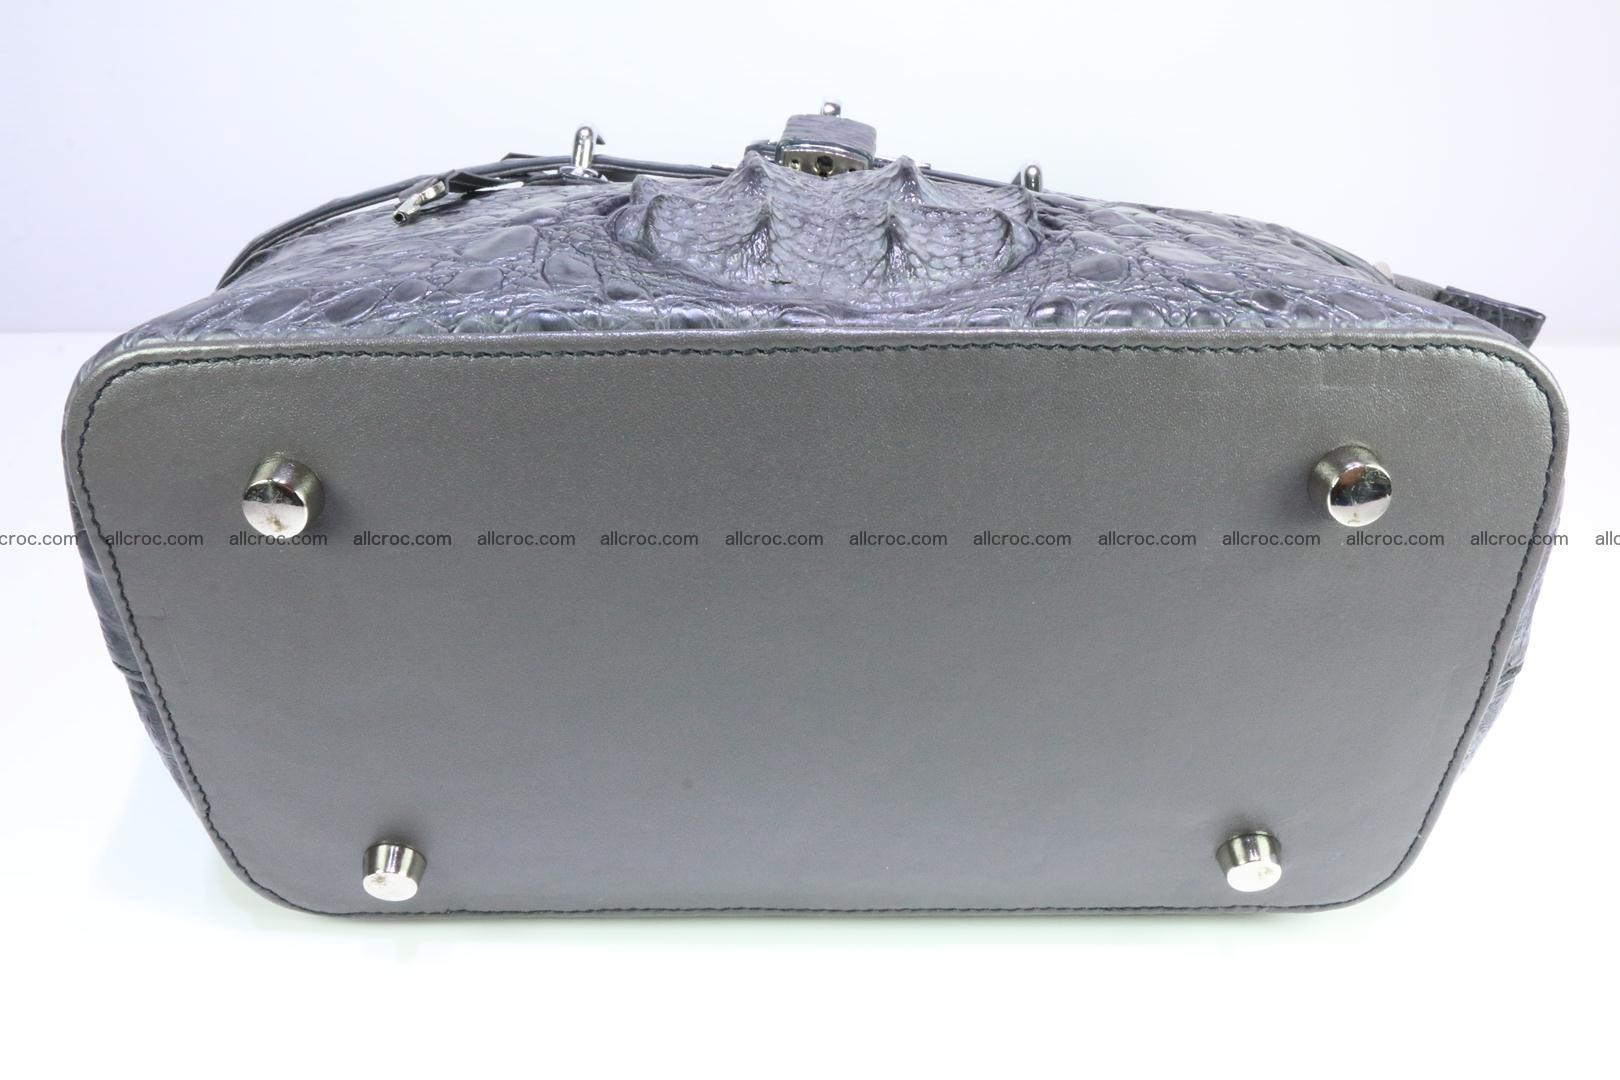 Genuine crocodile handbag for ladies 049 Foto 10